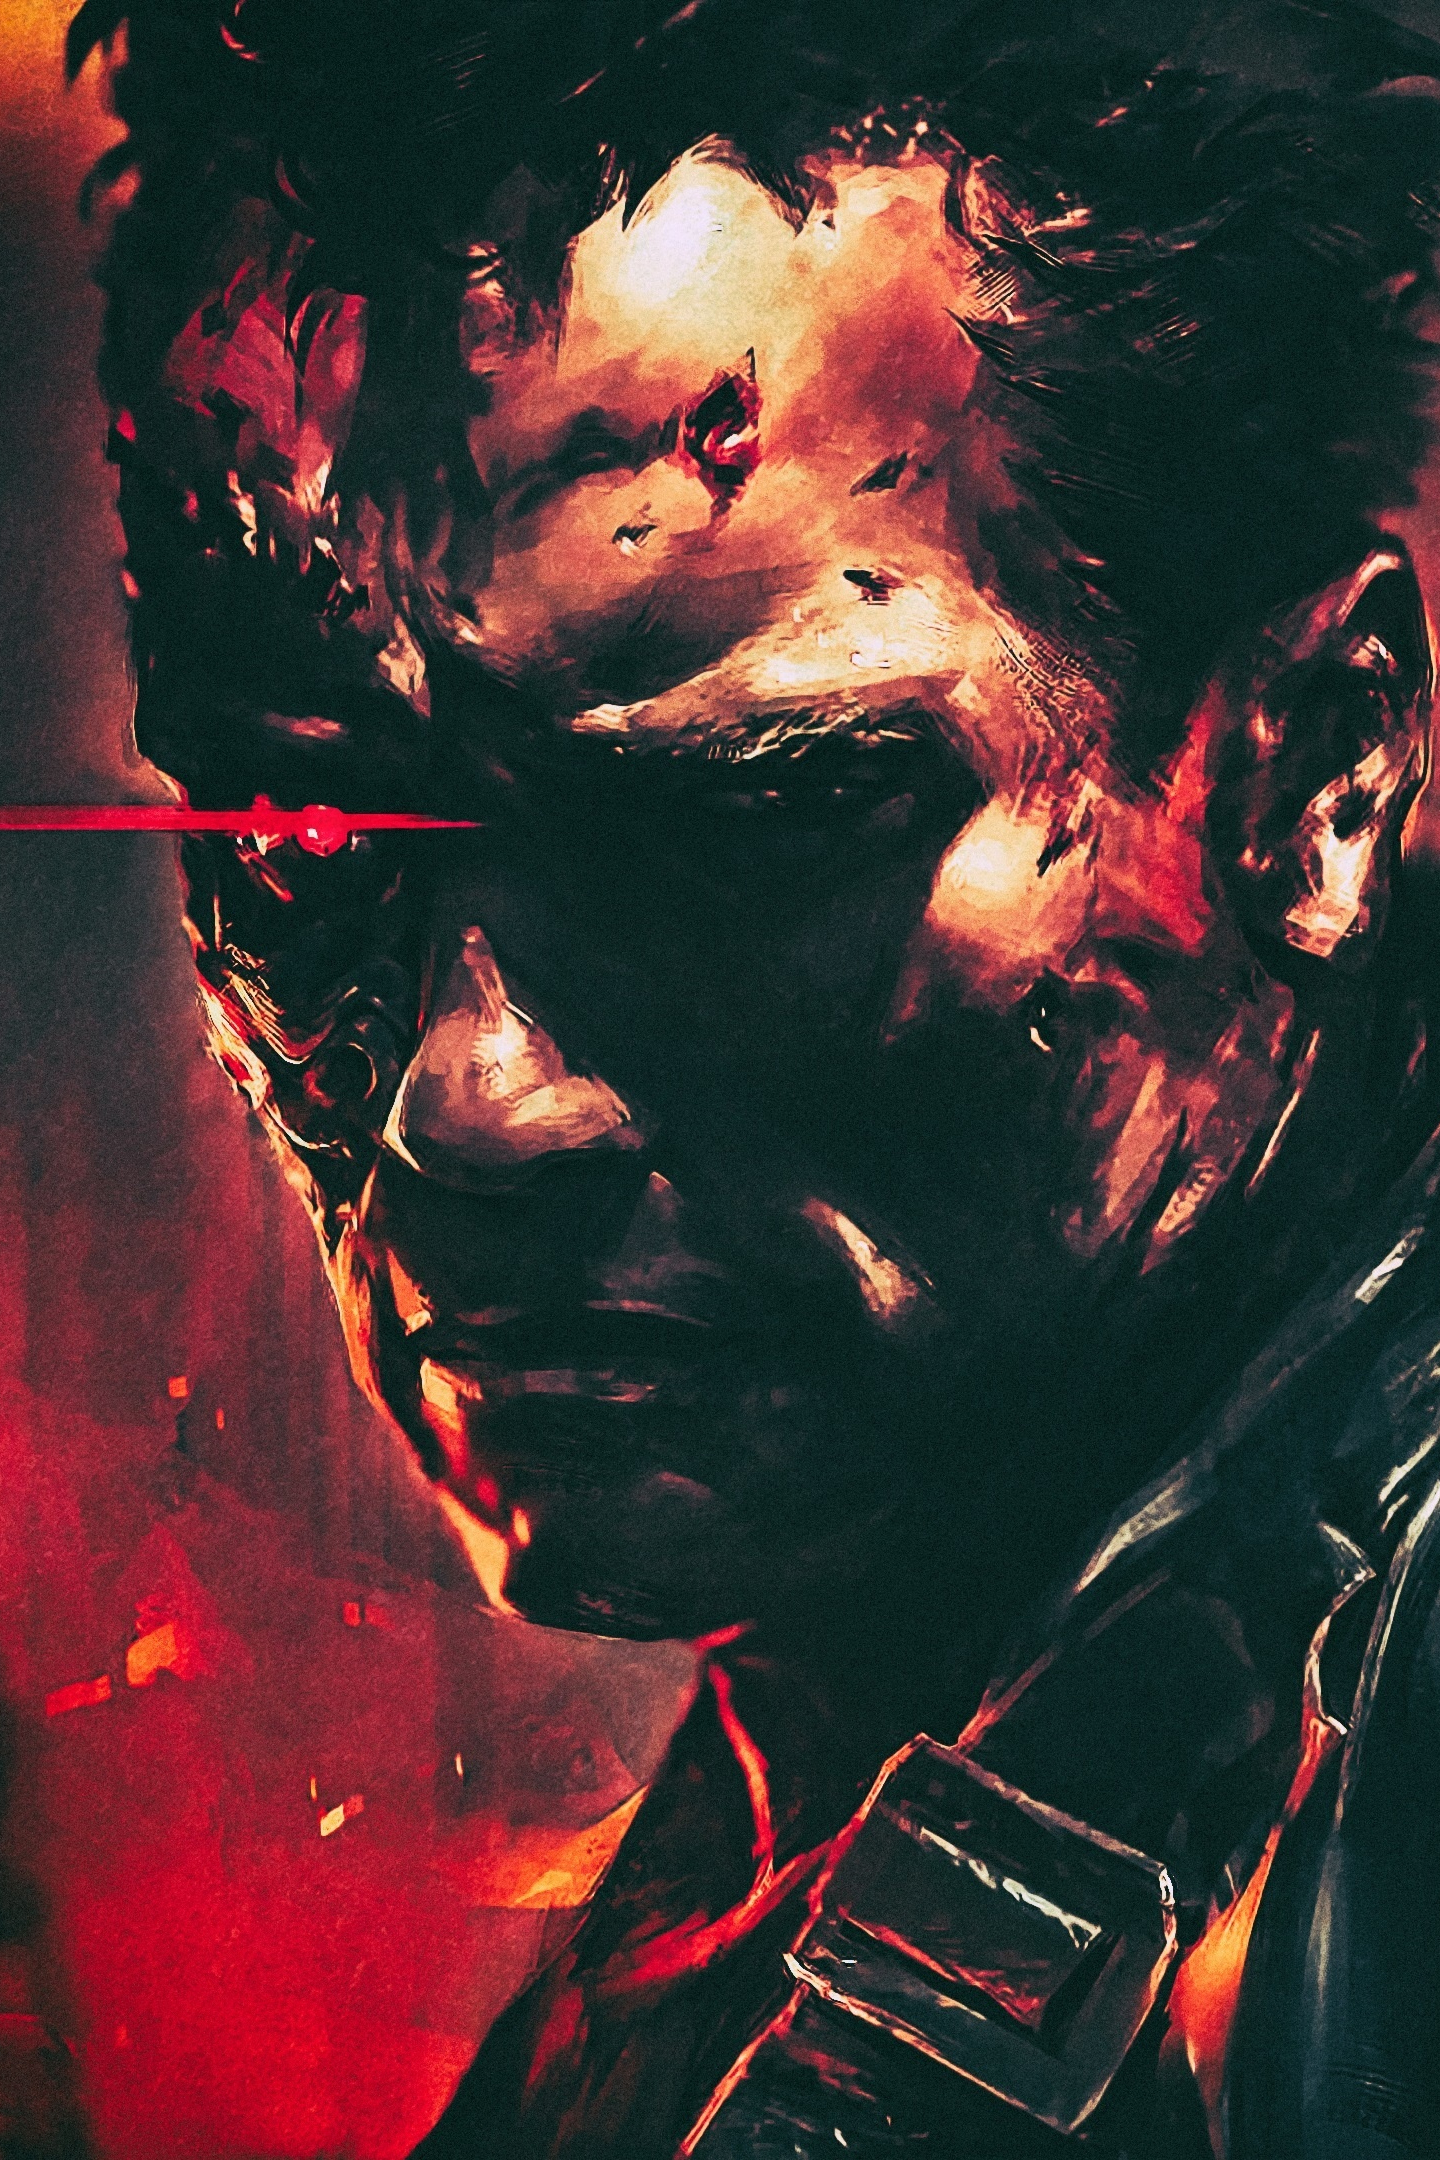 Download 1440x2560 wallpaper terminator 2 t 800 cyborg arnold schwarzenegger movie art qhd - Terminator 2 wallpaper hd ...